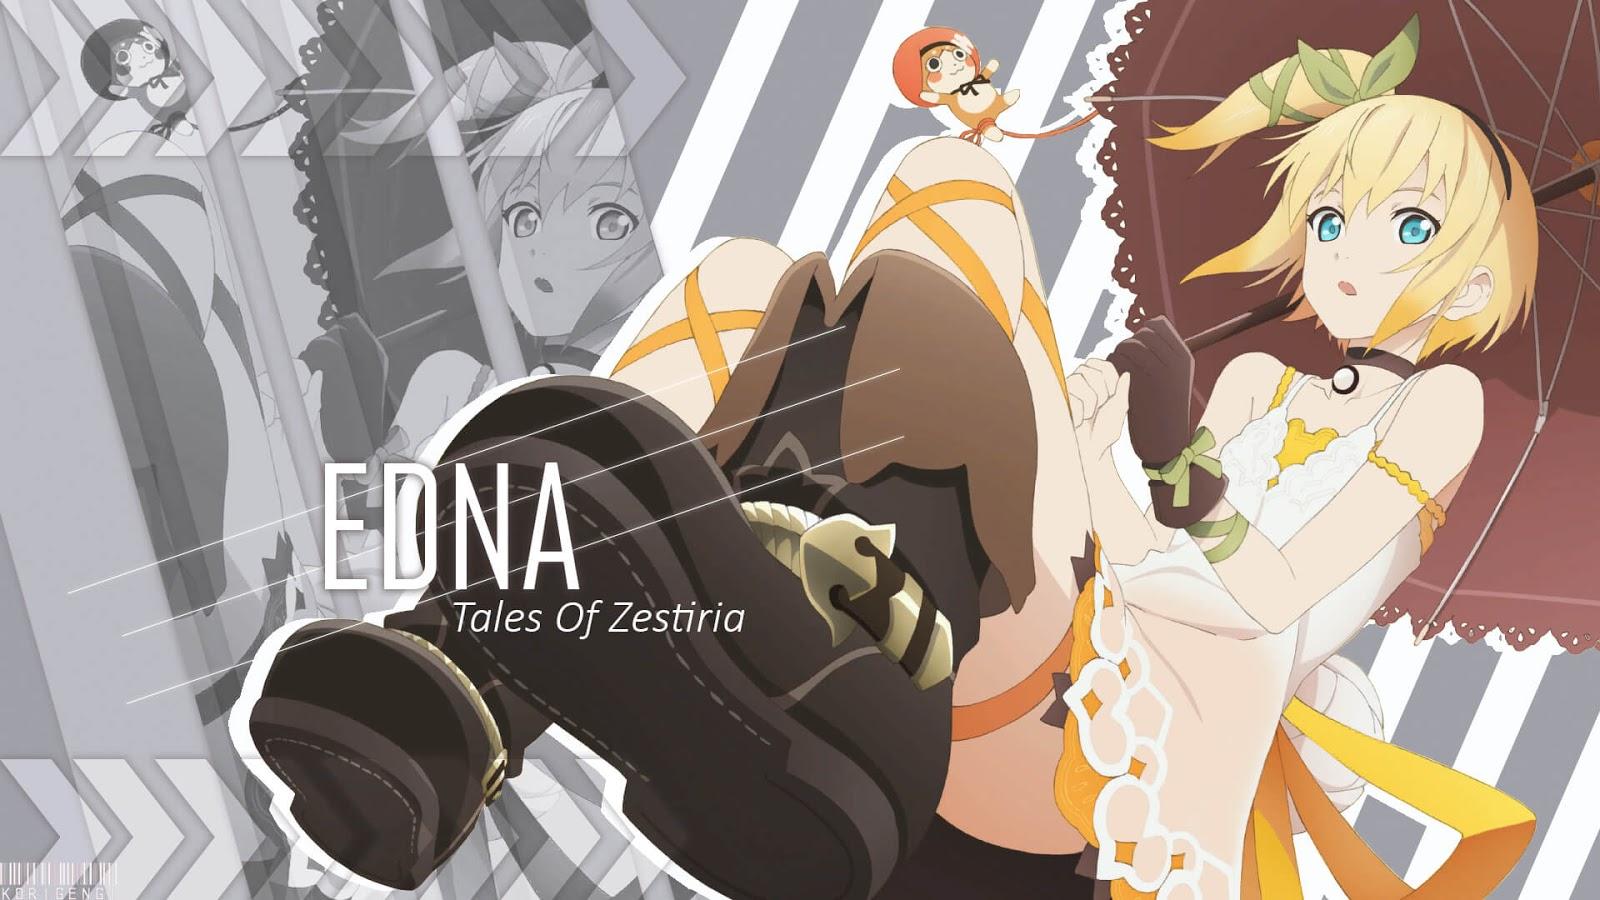 Pc Edna Tales Of Zestiria Wallpaper Anime Maniac